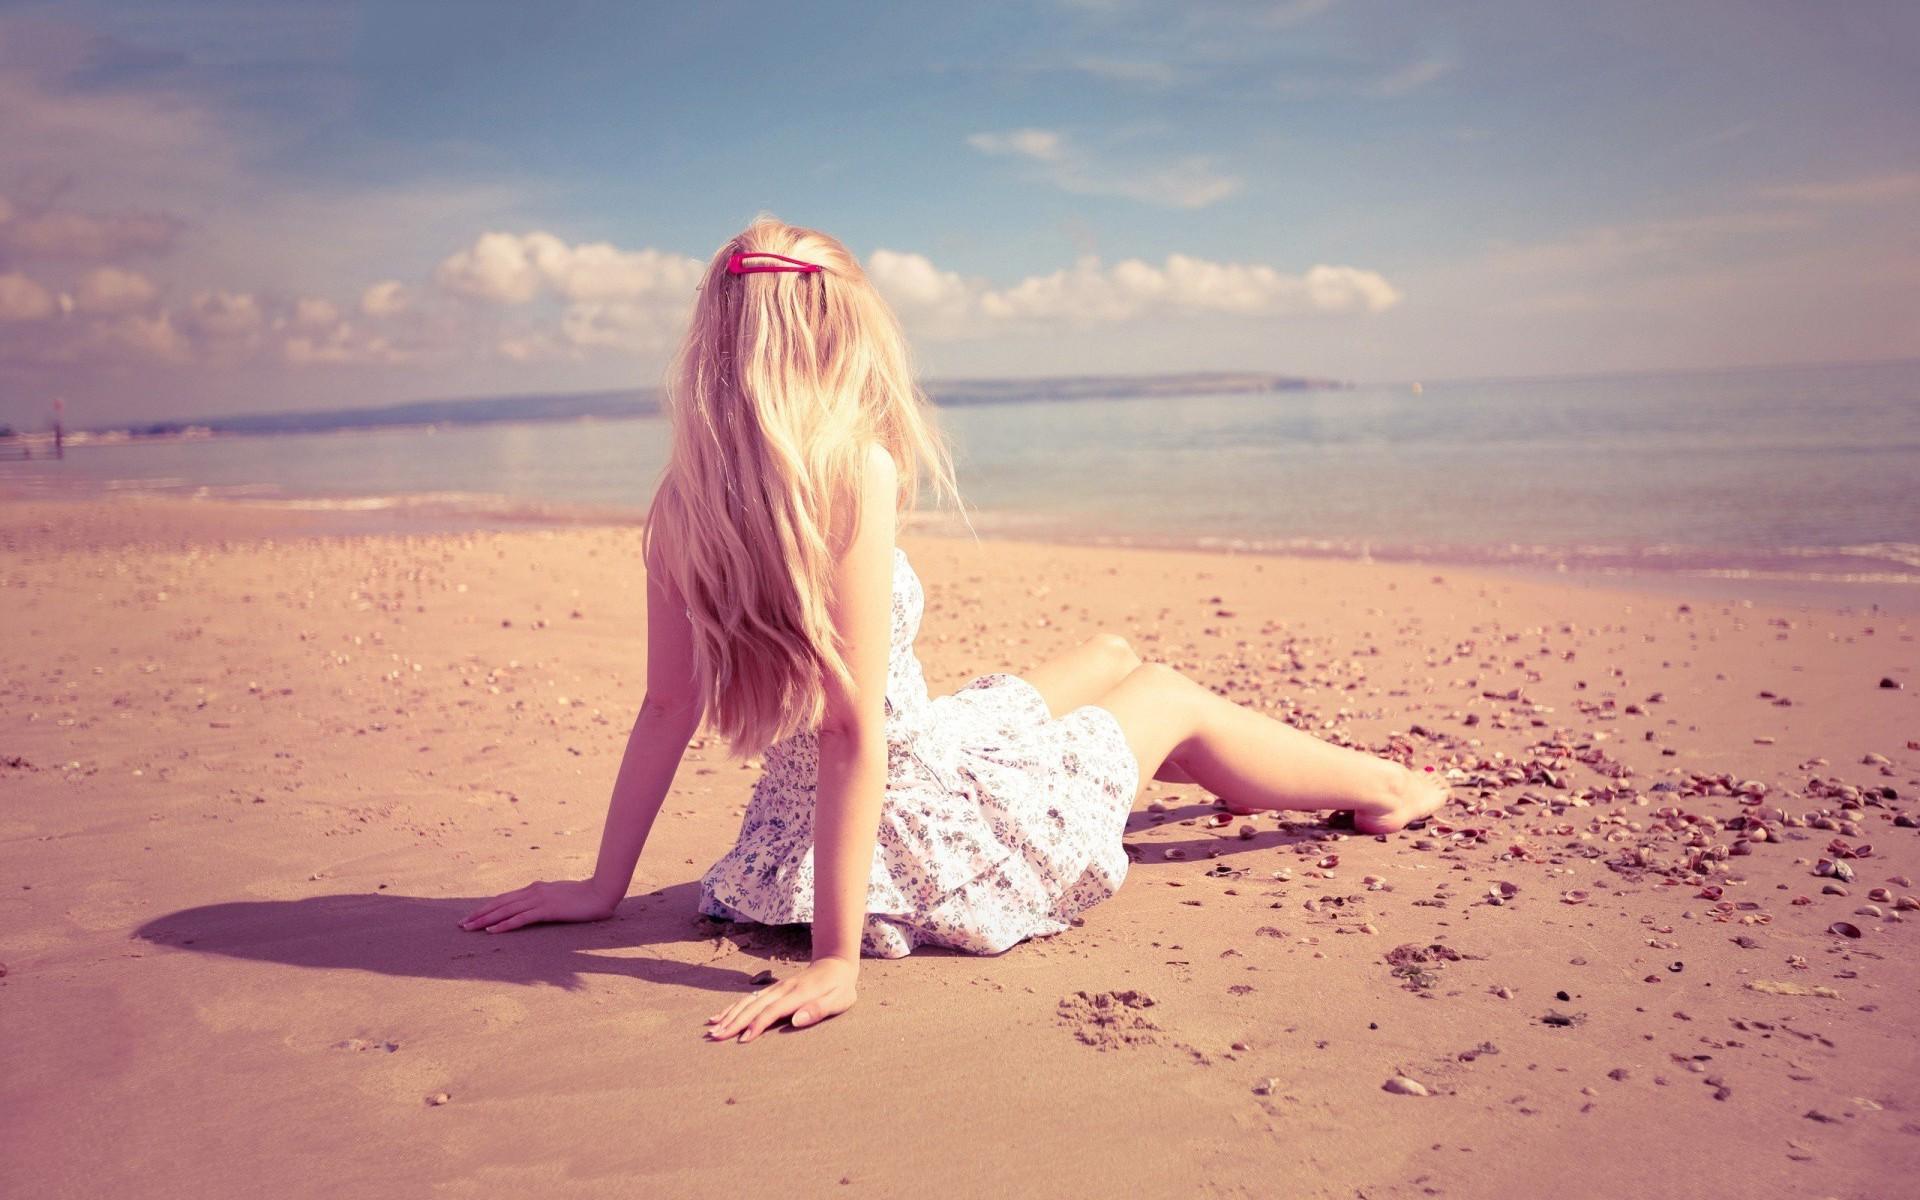 40 chill wallpapers download free stunning full hd - Beach girl wallpaper hd ...